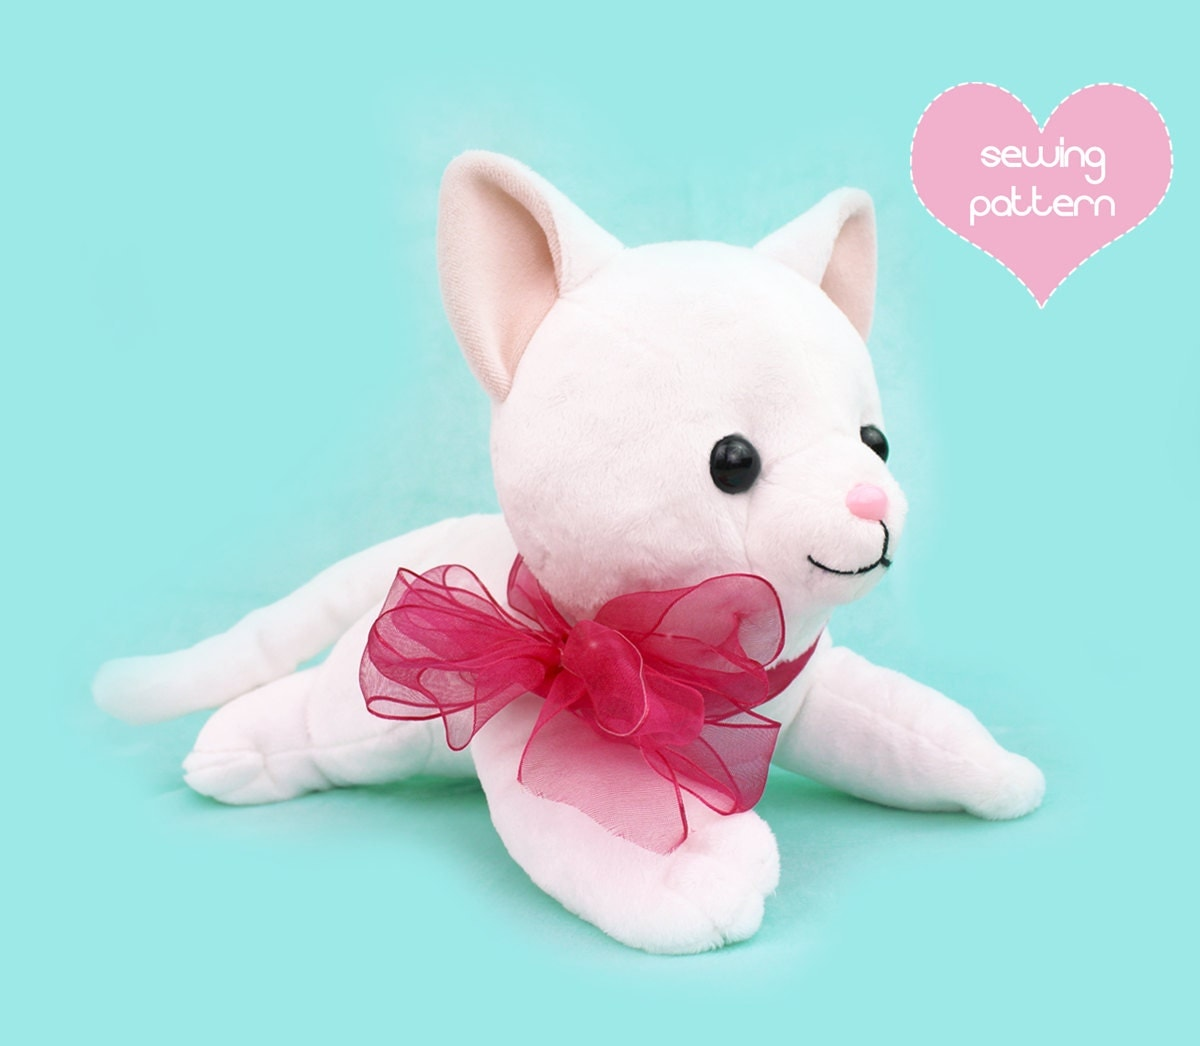 sewing templates for stuffed animals - pdf sewing pattern cat stuffed animal large kawaii